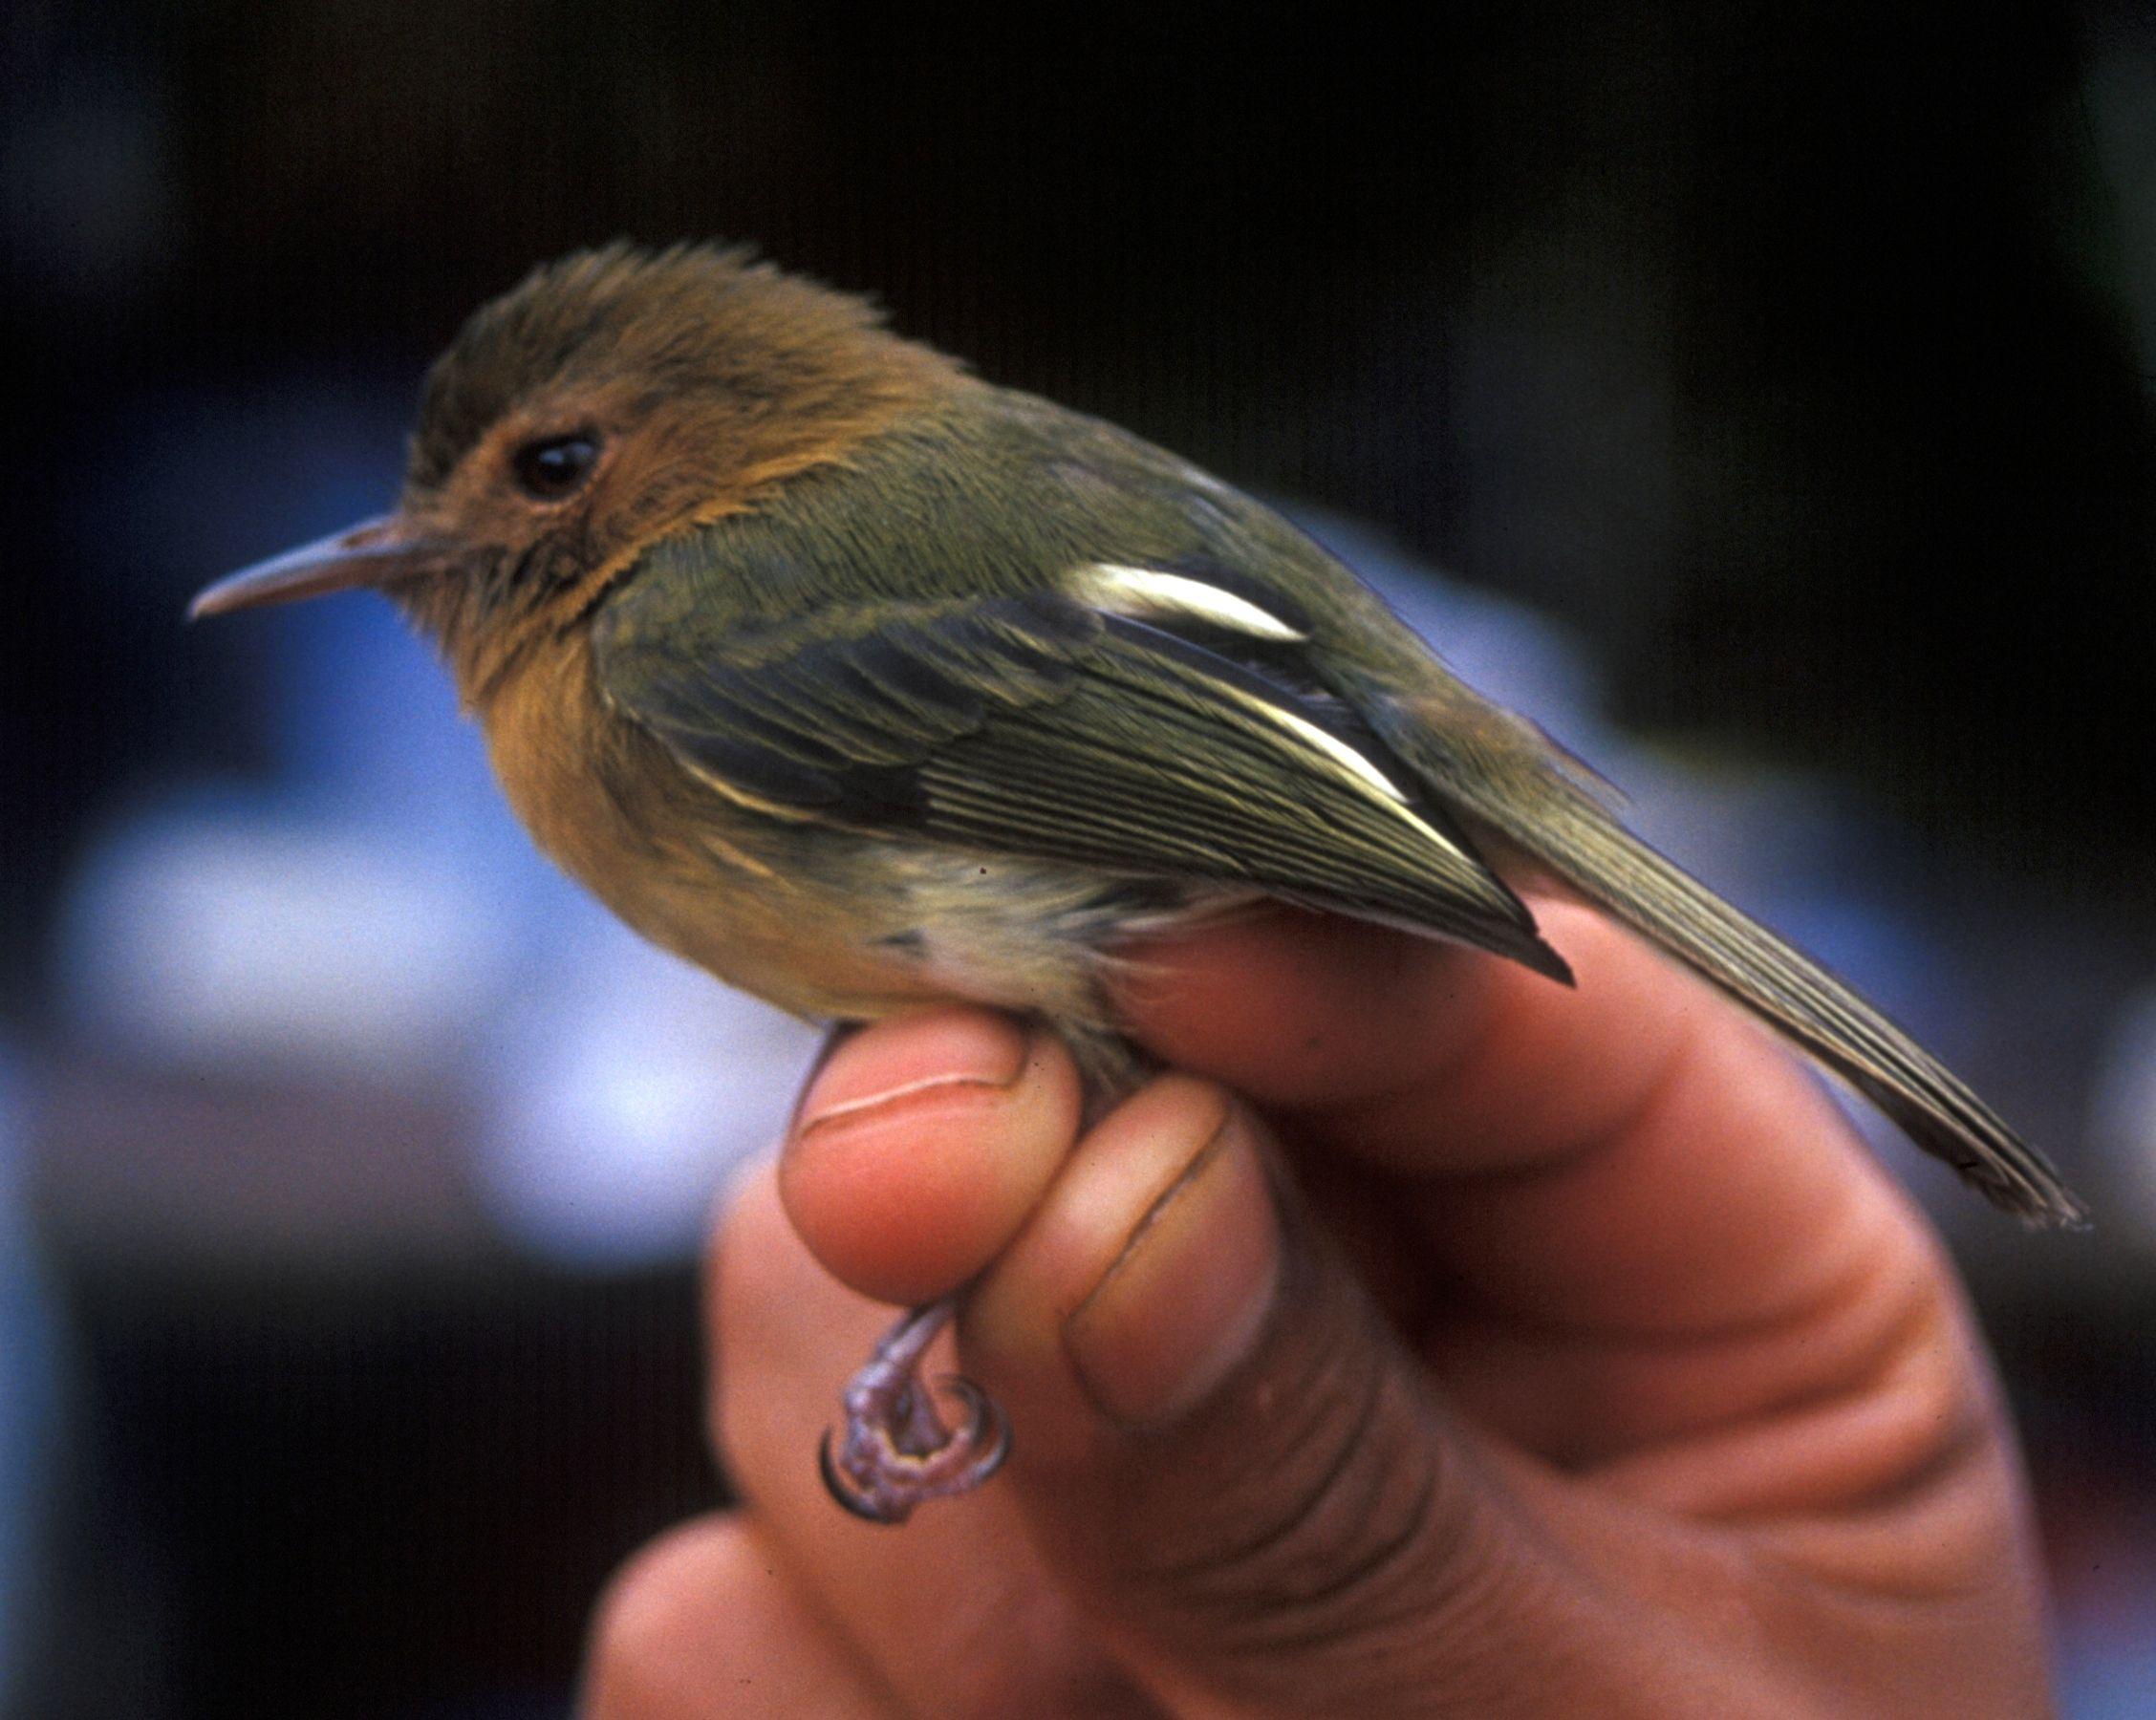 4050. Cinnamon-breasted Tody-tyrant (Hemitriccus cinnamomeipectus) | Ecuador, Peru